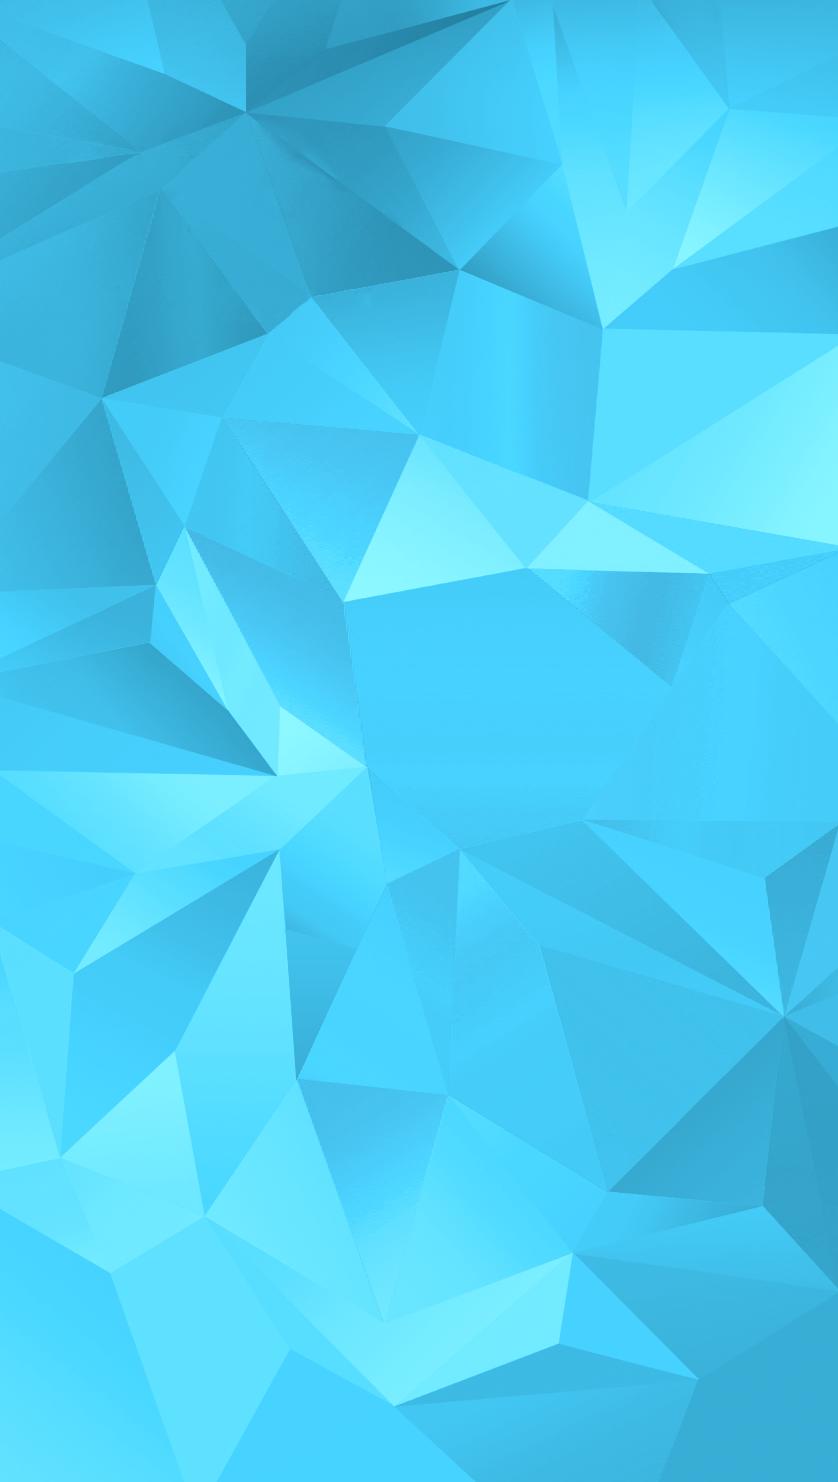 blue background samsung galaxy S5